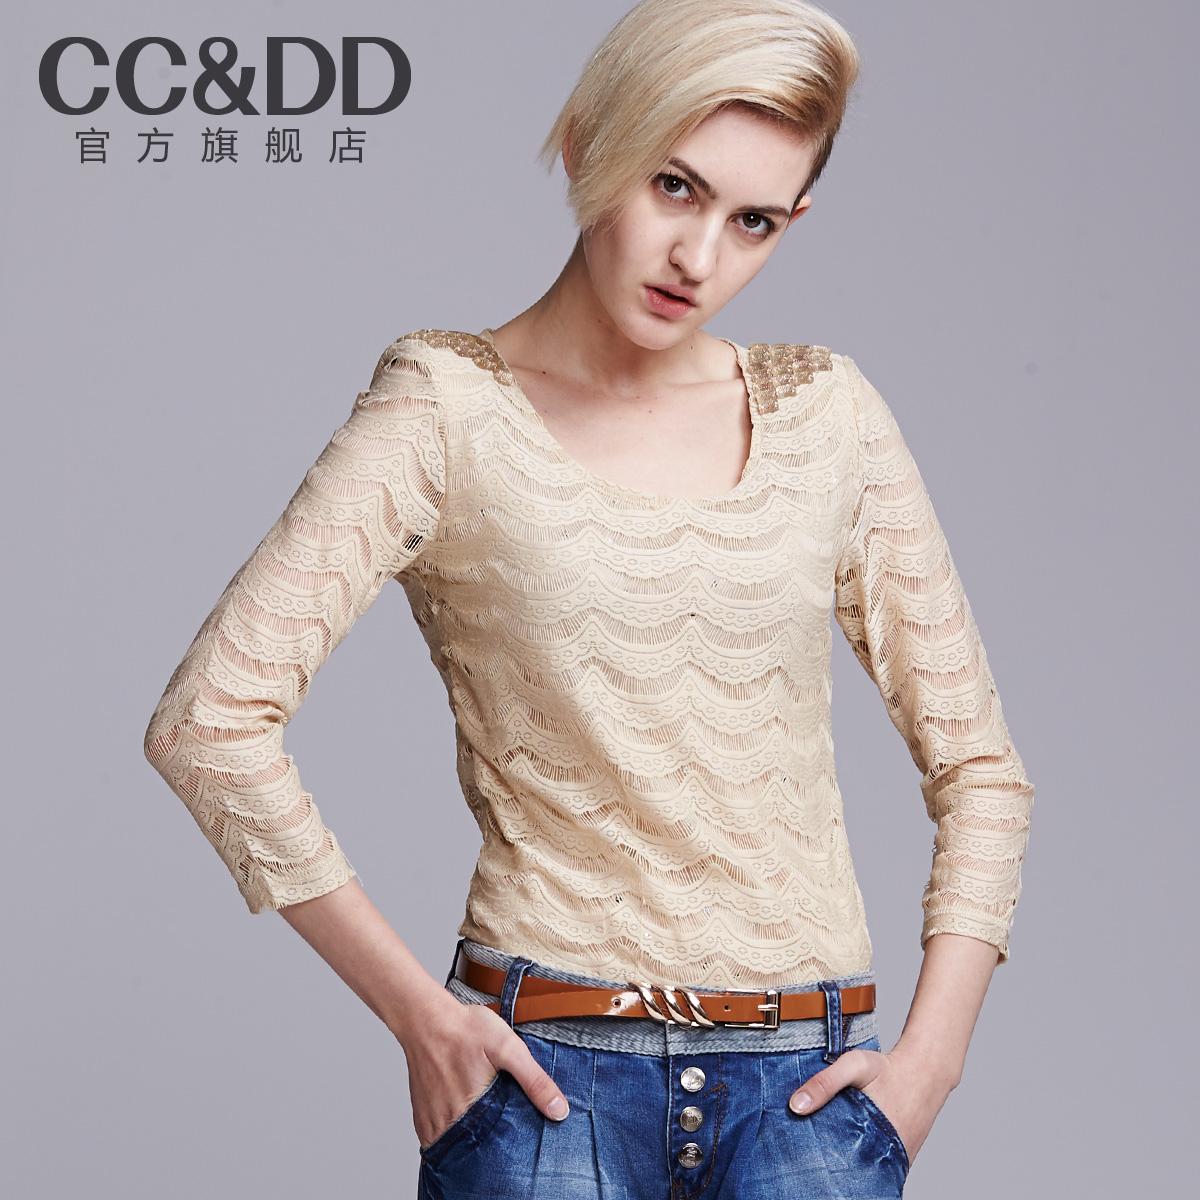 ccdd女装正品秋装_ccdd 2014春新款女装蕾丝打底小衫女士时尚性感七分袖上装打底衣